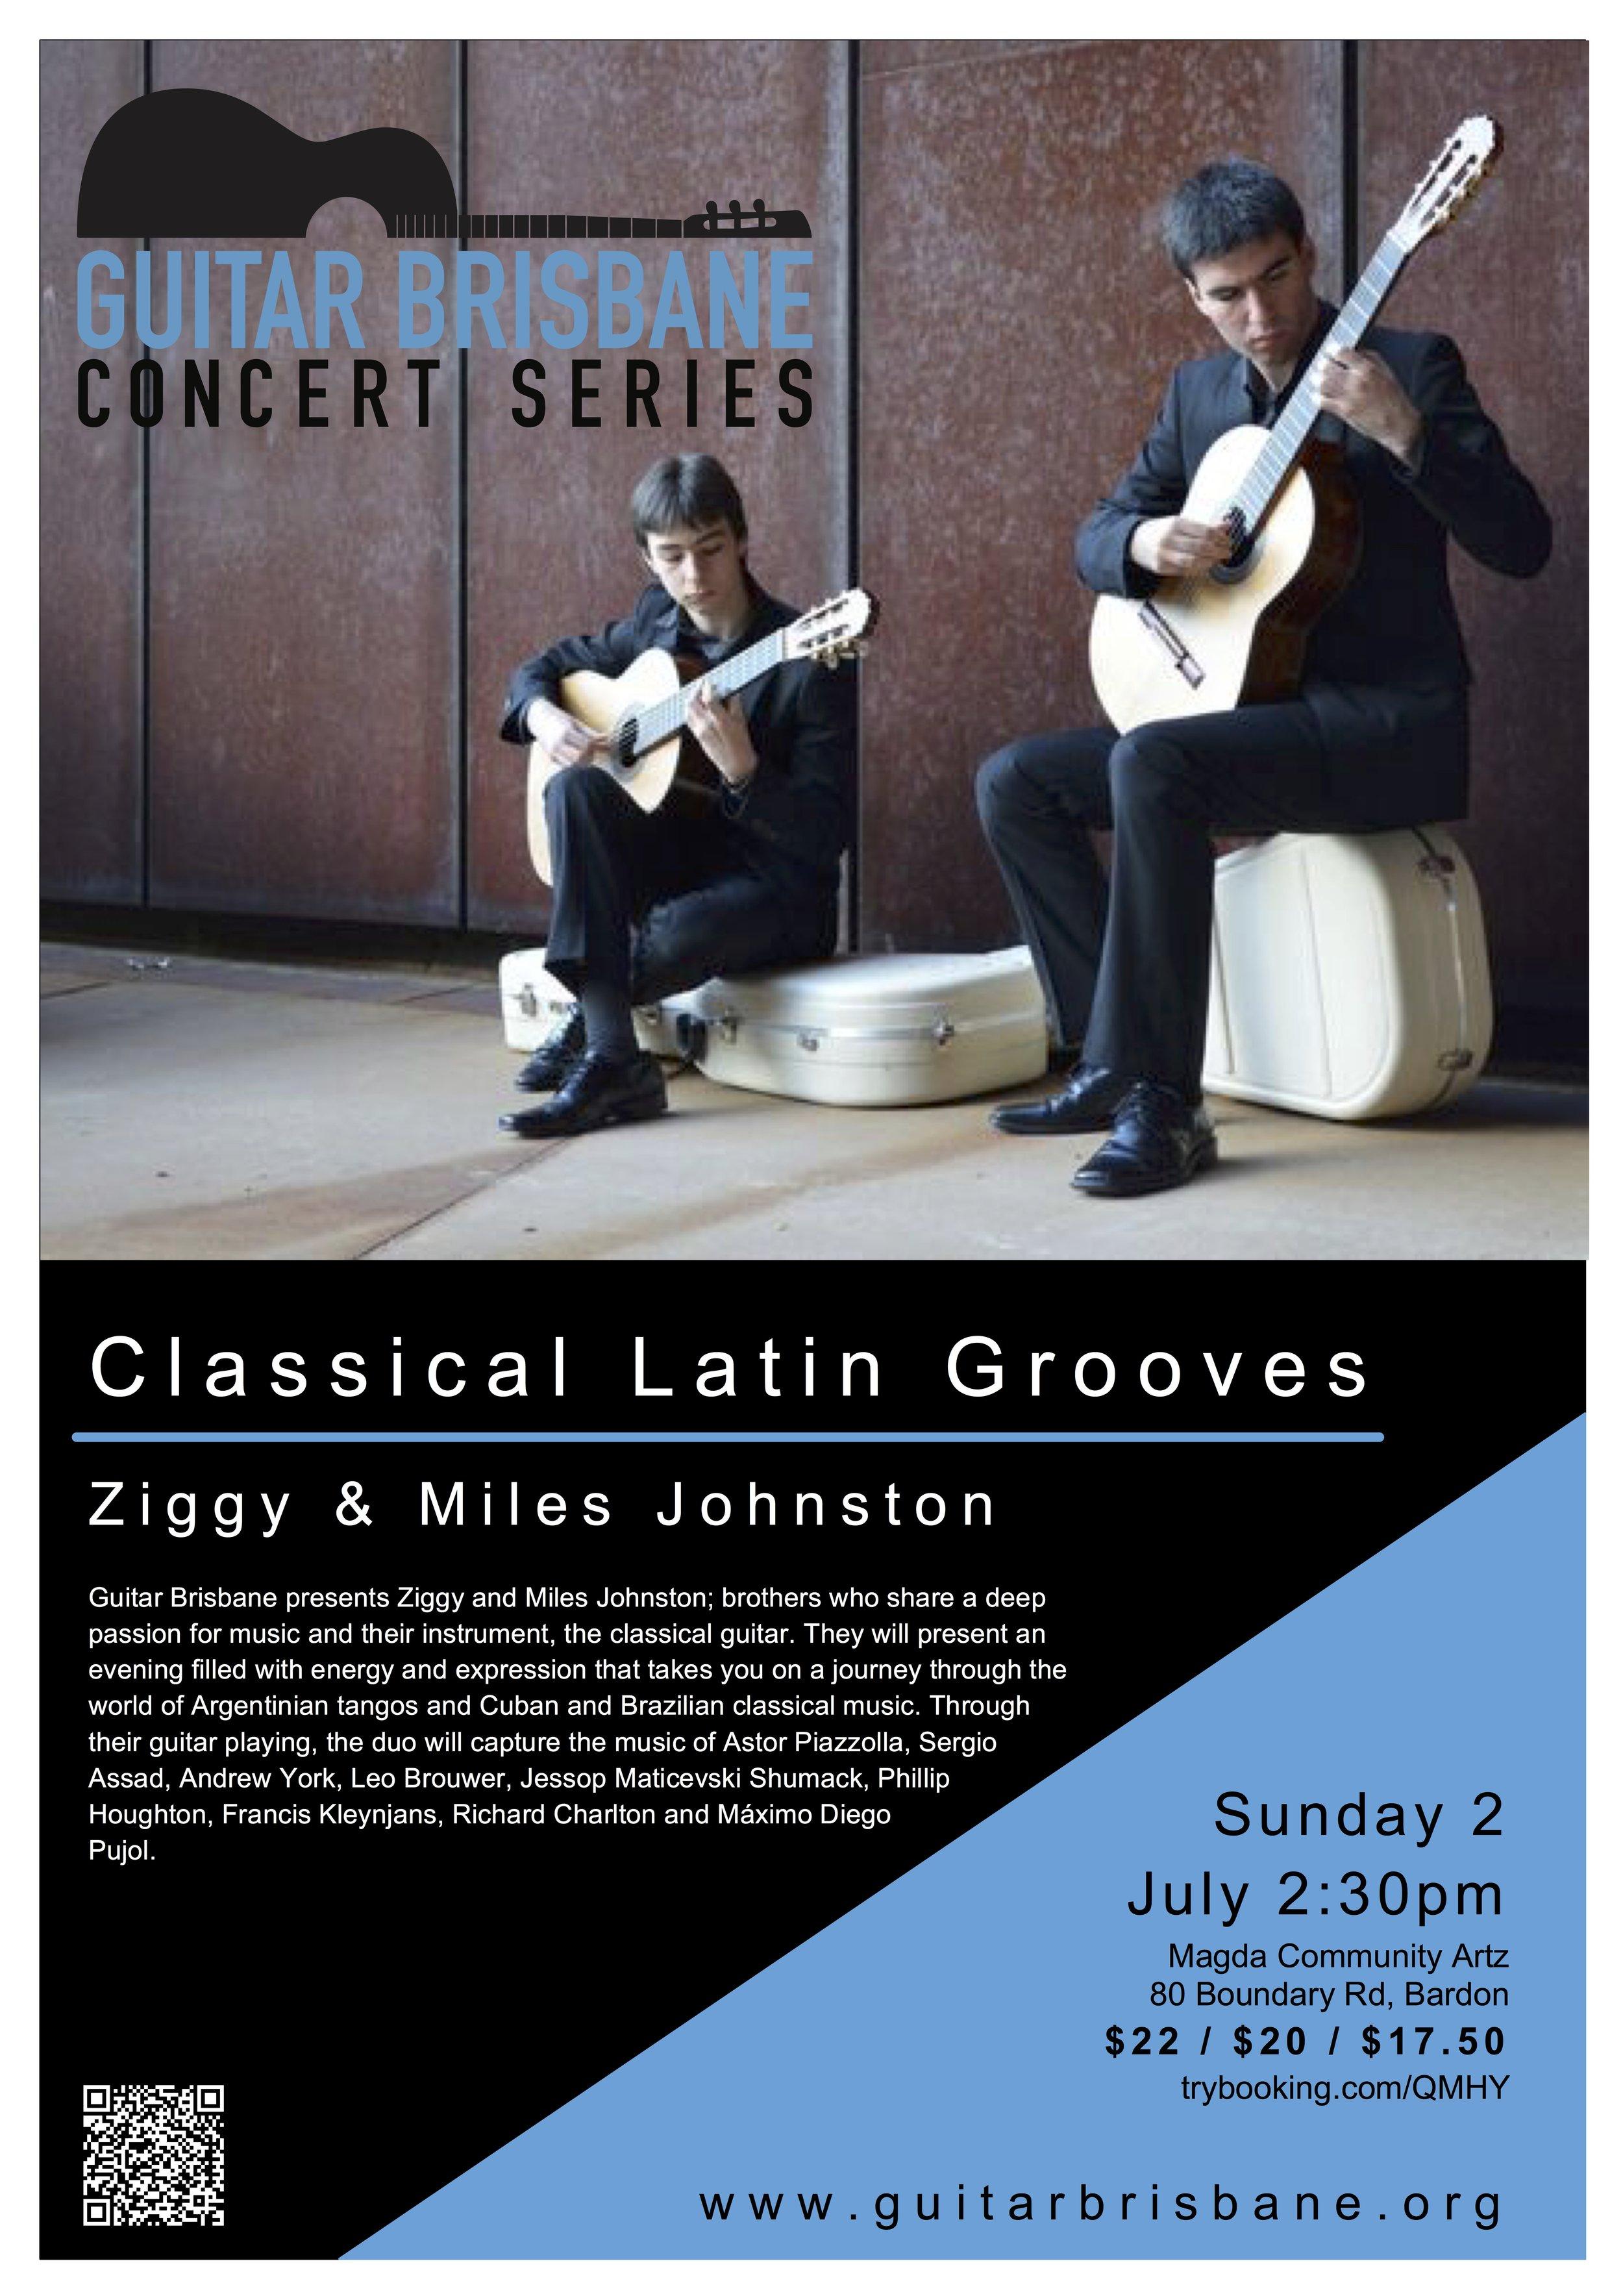 A3 poster Ziggy & Miles Johnston.jpg